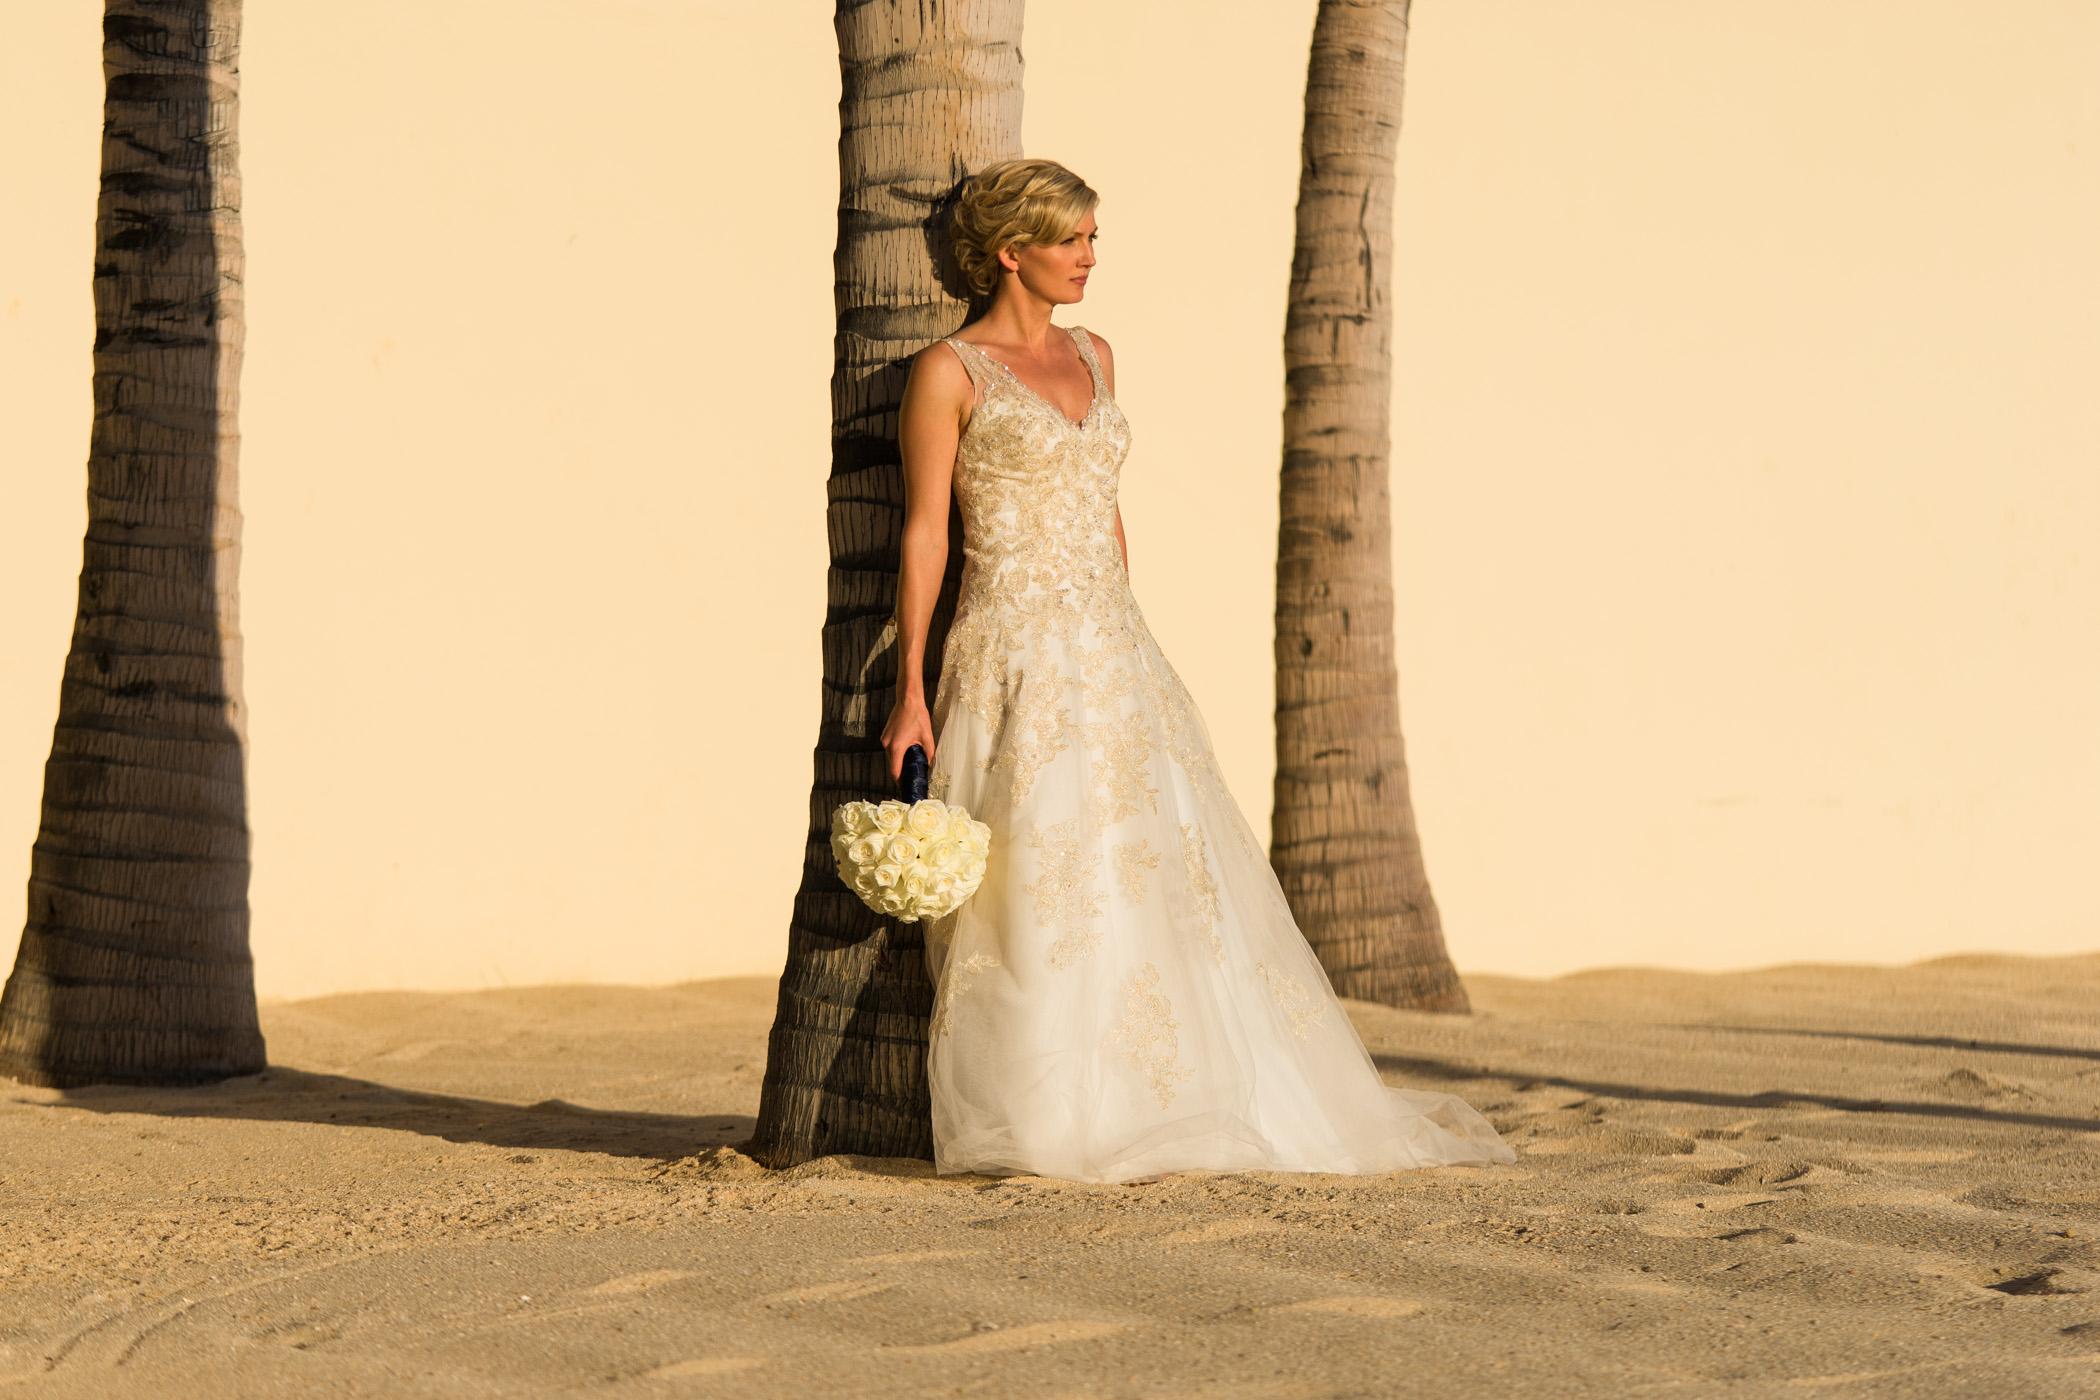 tiffanyterrancewedding-149.jpg